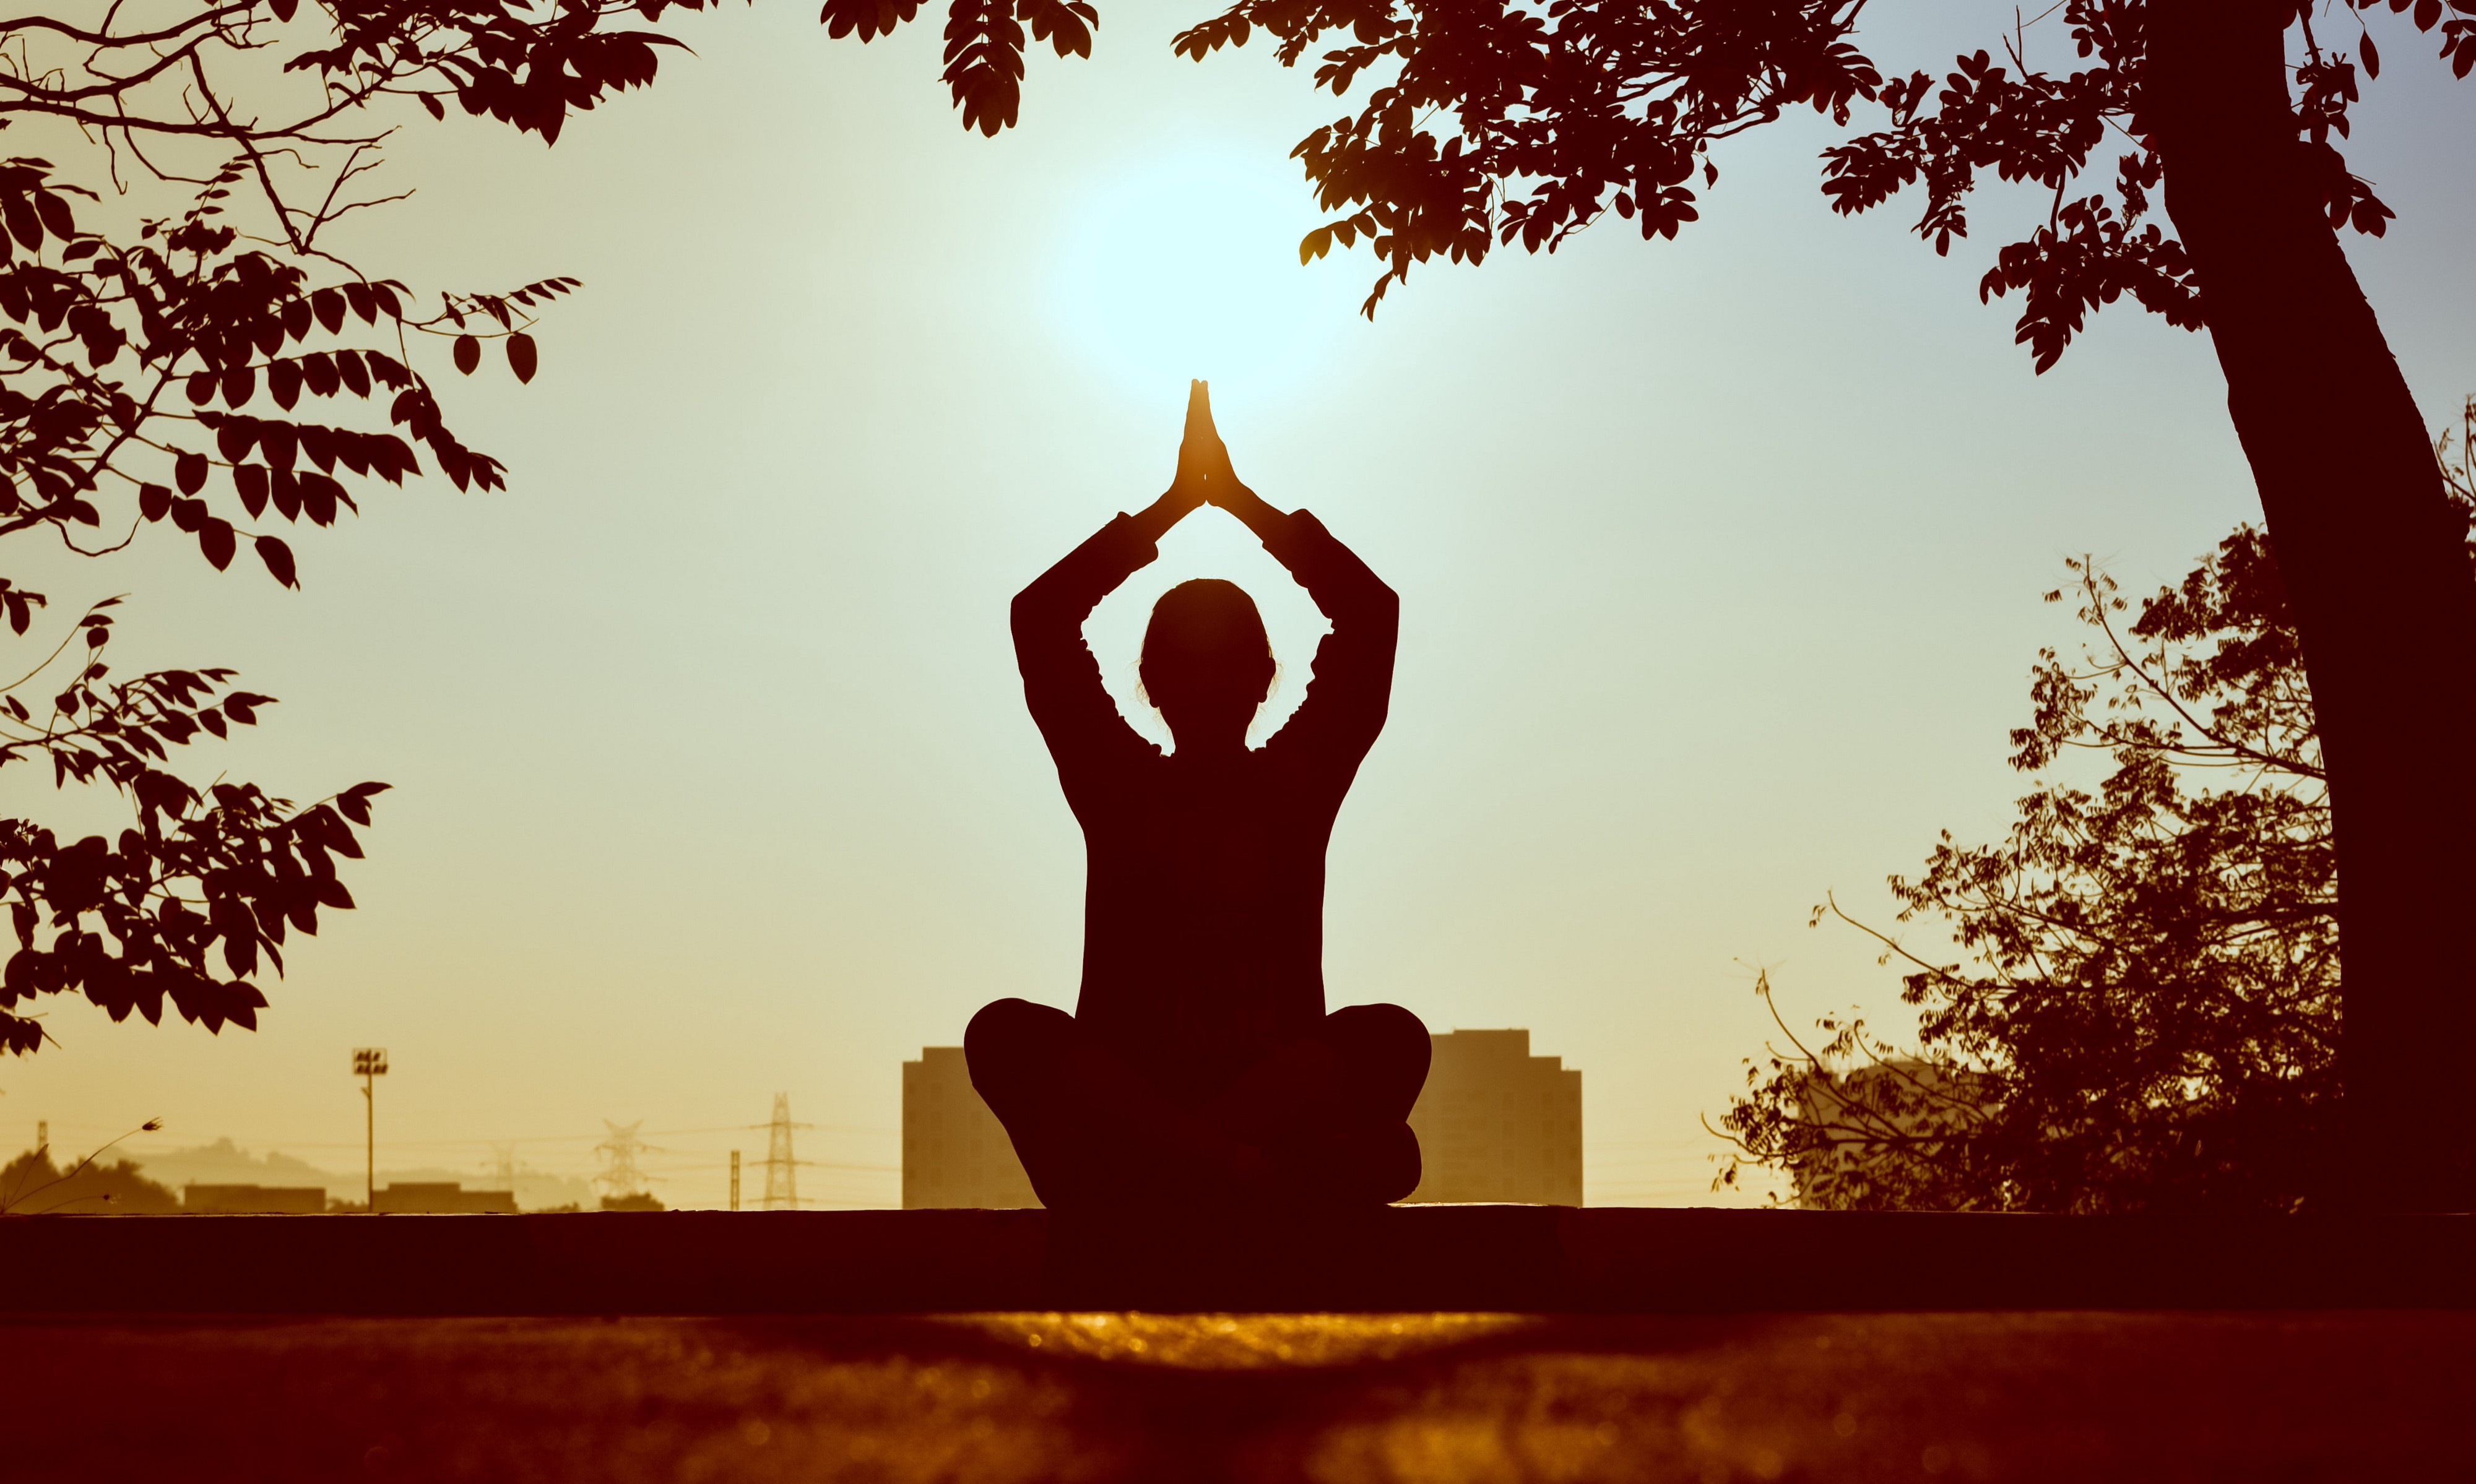 PunjabKesari, Depression, मानसिक तनाव, Upay Of Remove Stress, Remedies of Depression, Niti Gyan In Hindi, Meditation, Niti Shastra, Success mantra in hindi